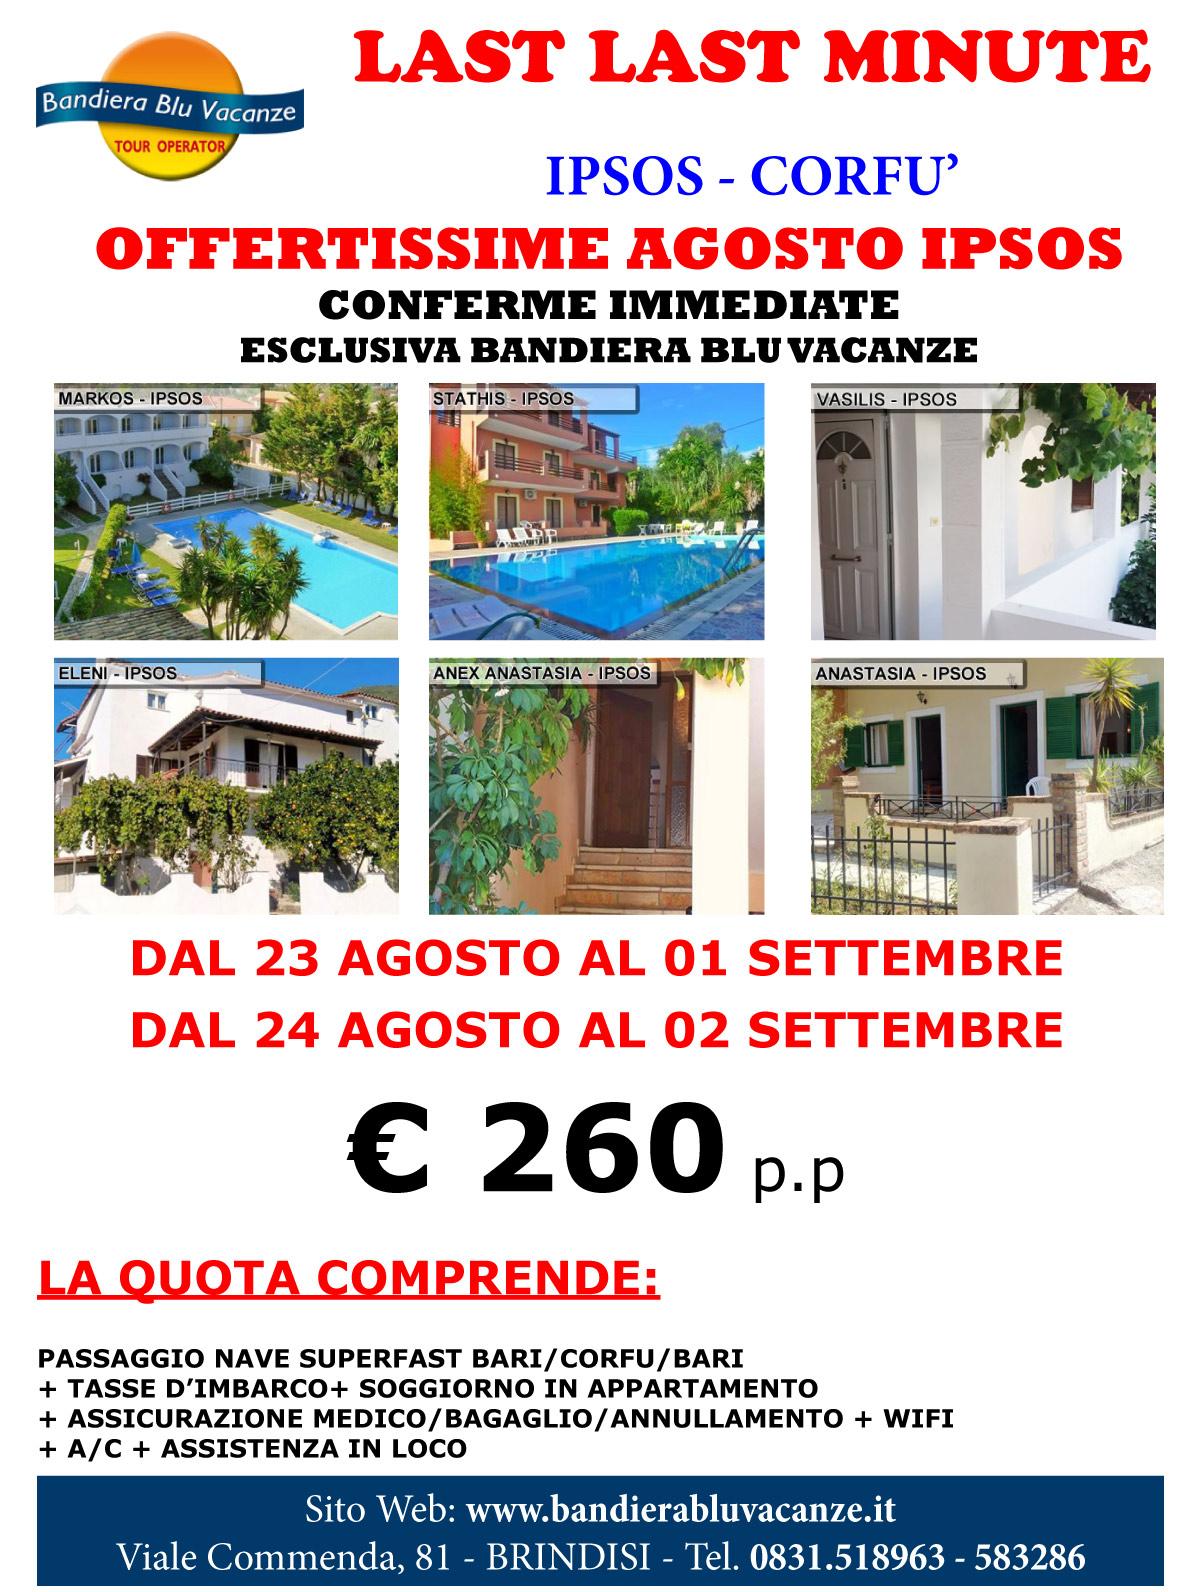 Corfù - Ipsos: last last minute - Dal 23 Agosto al 01 Settembre e dal 24 Agosto al 02 Settembre